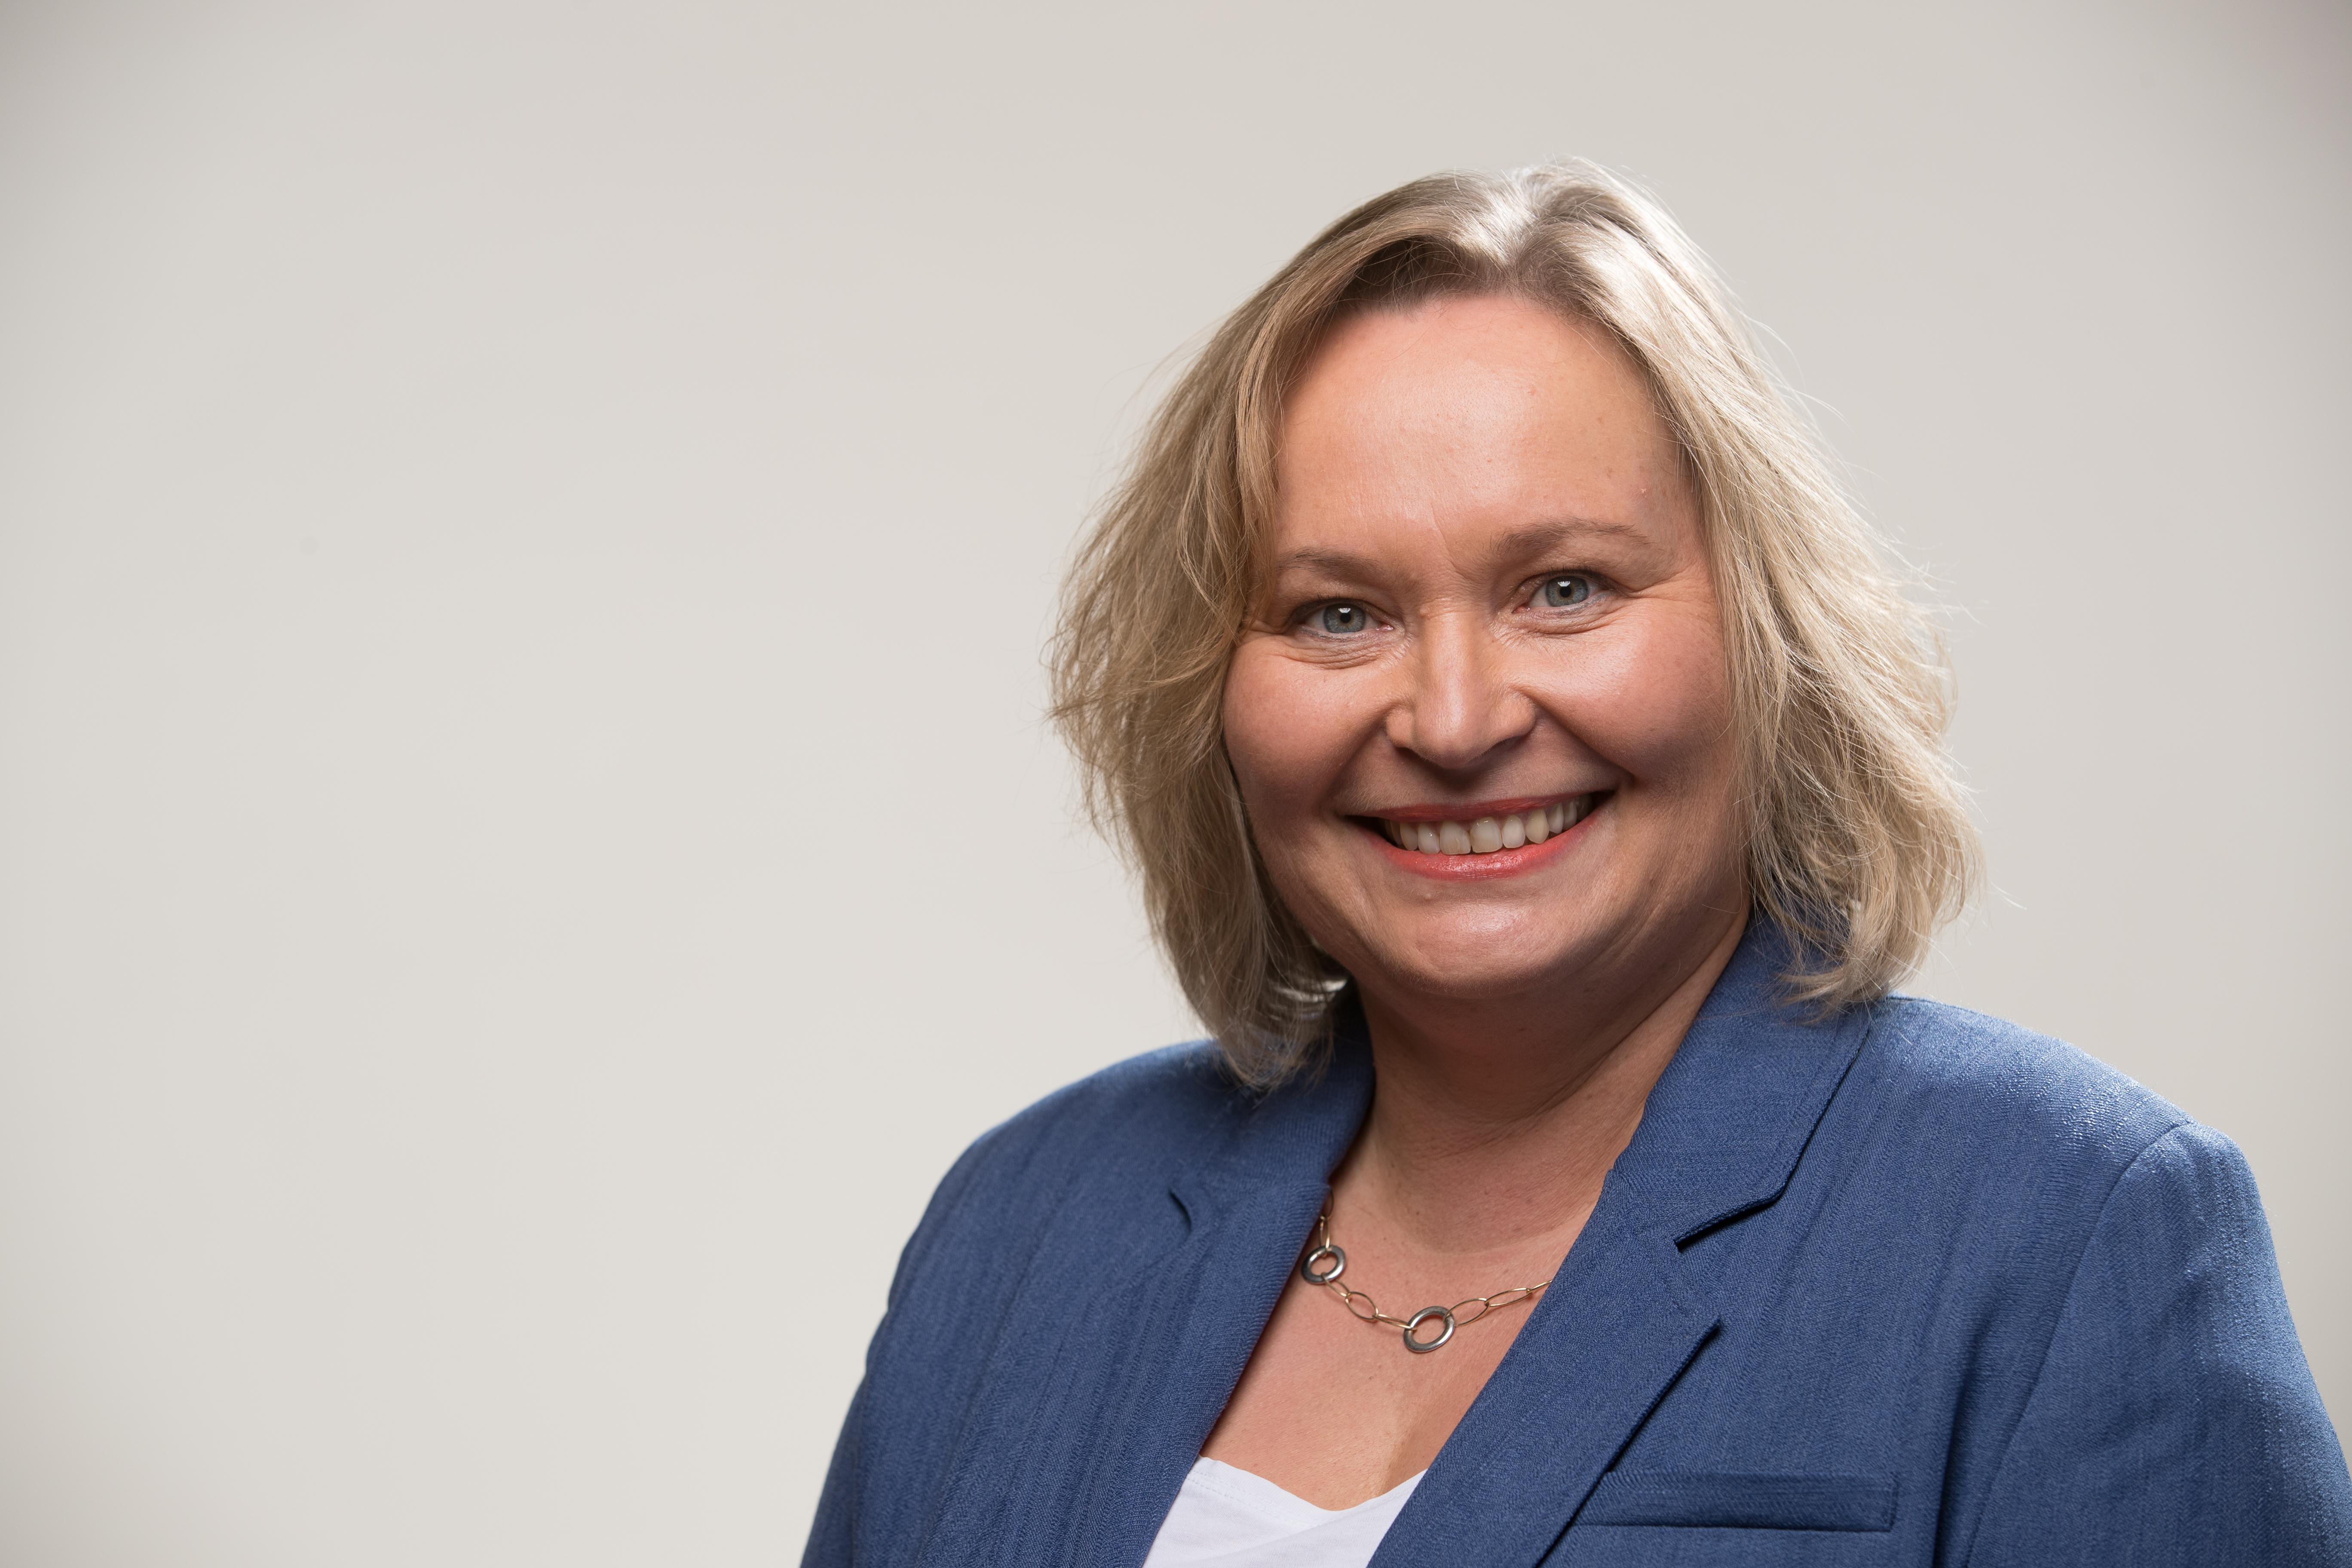 Bürgermeisterin Beate Nielsen